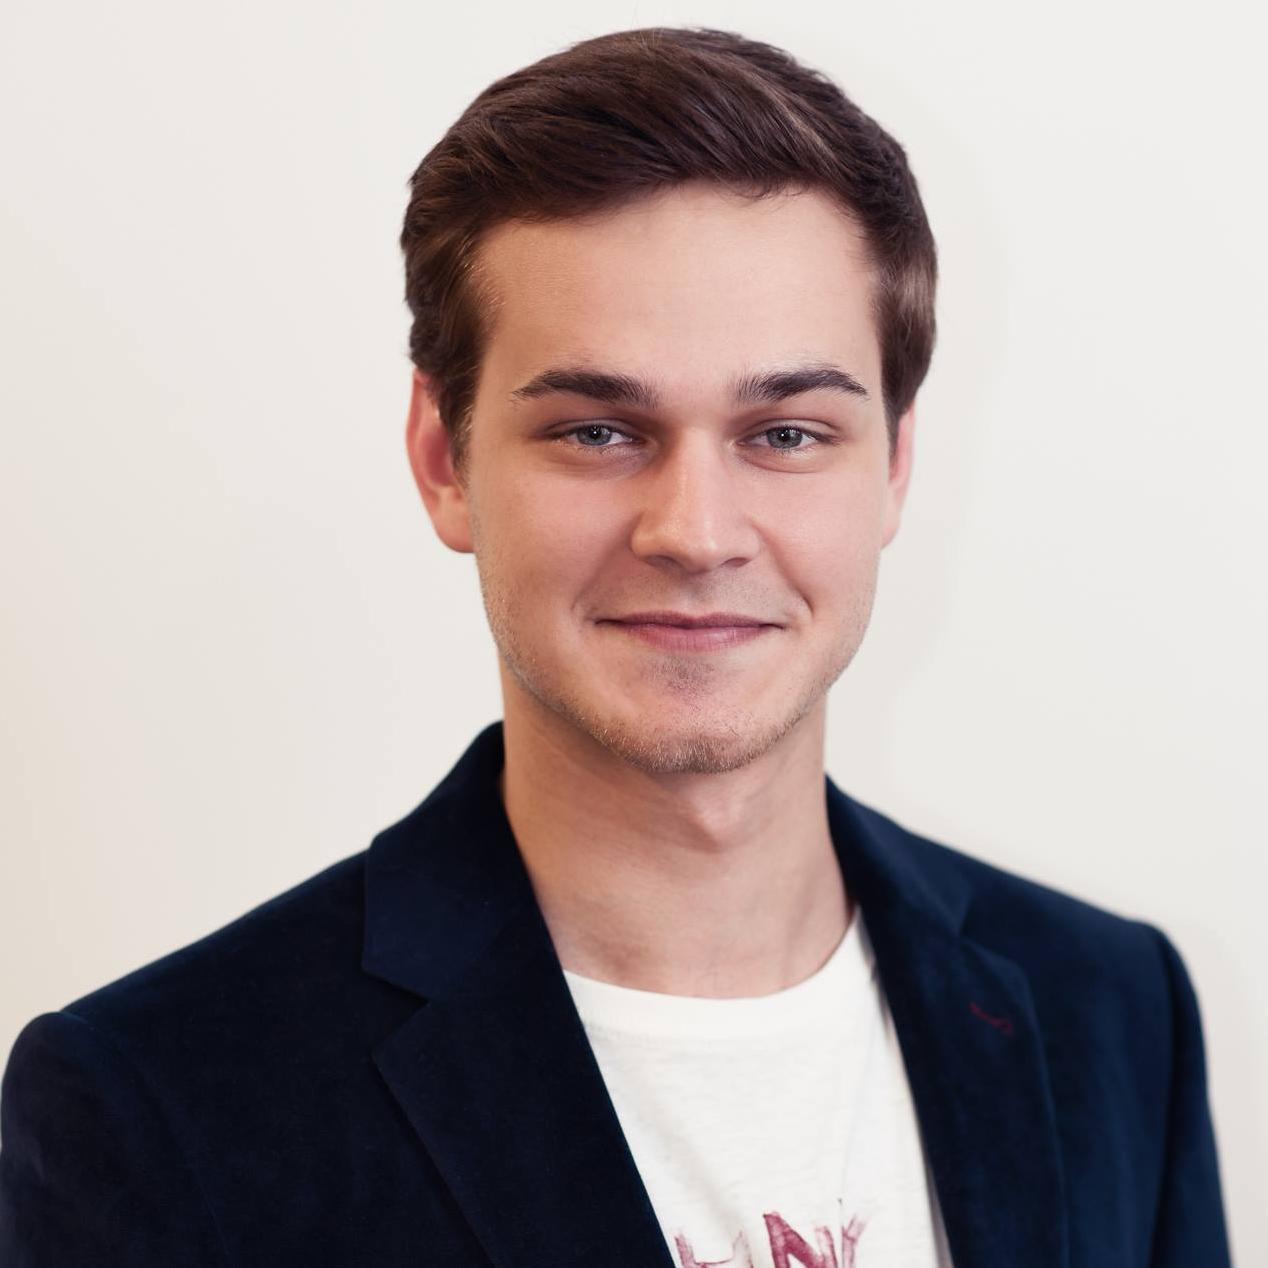 Damian Brhel